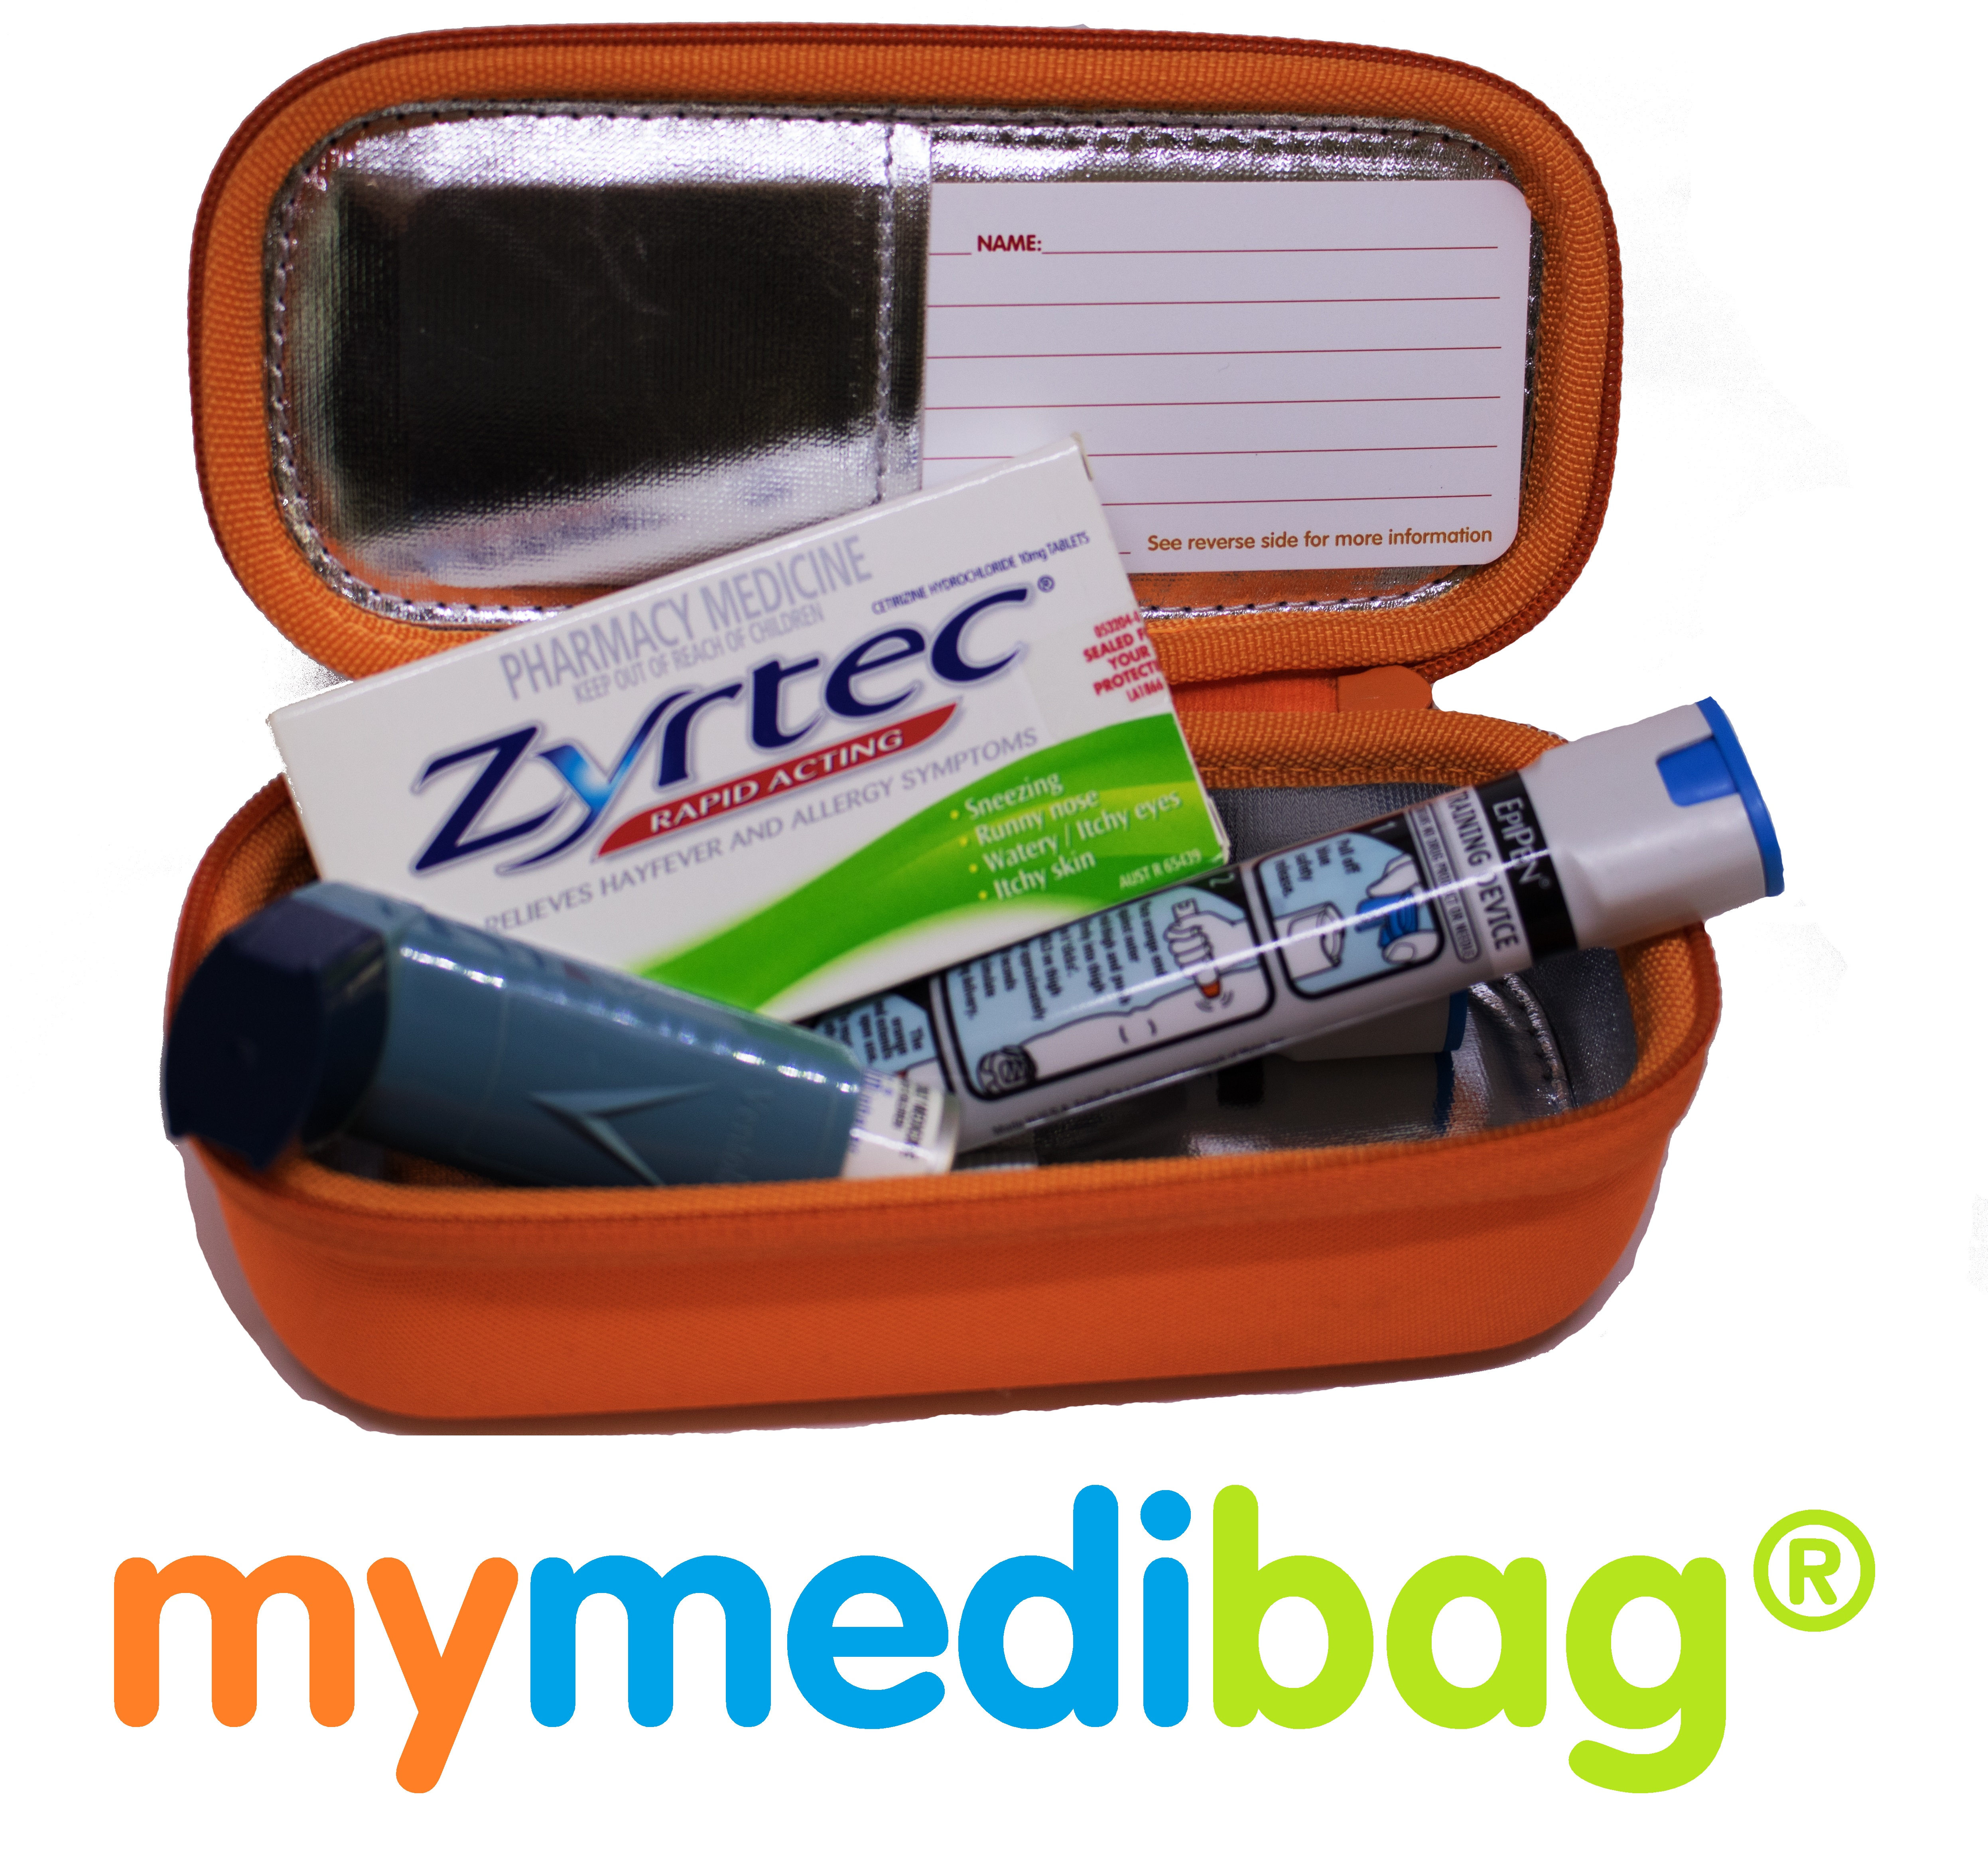 Mymedibag Standard with Medicine